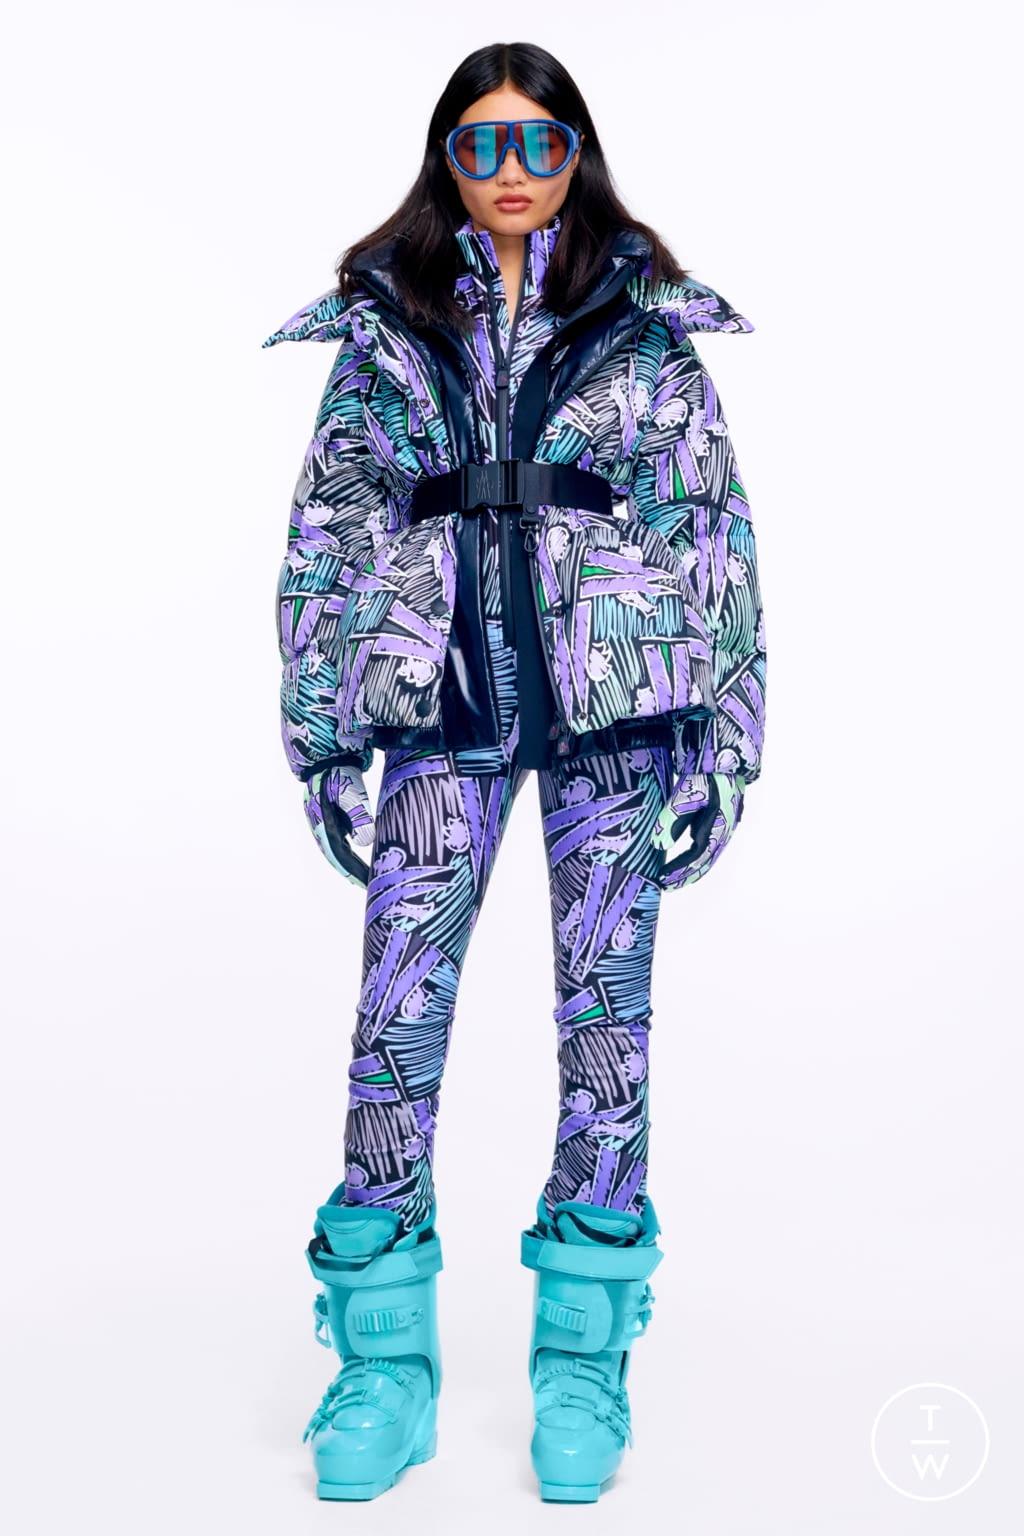 Fashion Week Milan Fall/Winter 2020 look 33 de la collection 3 Moncler Grenoble womenswear